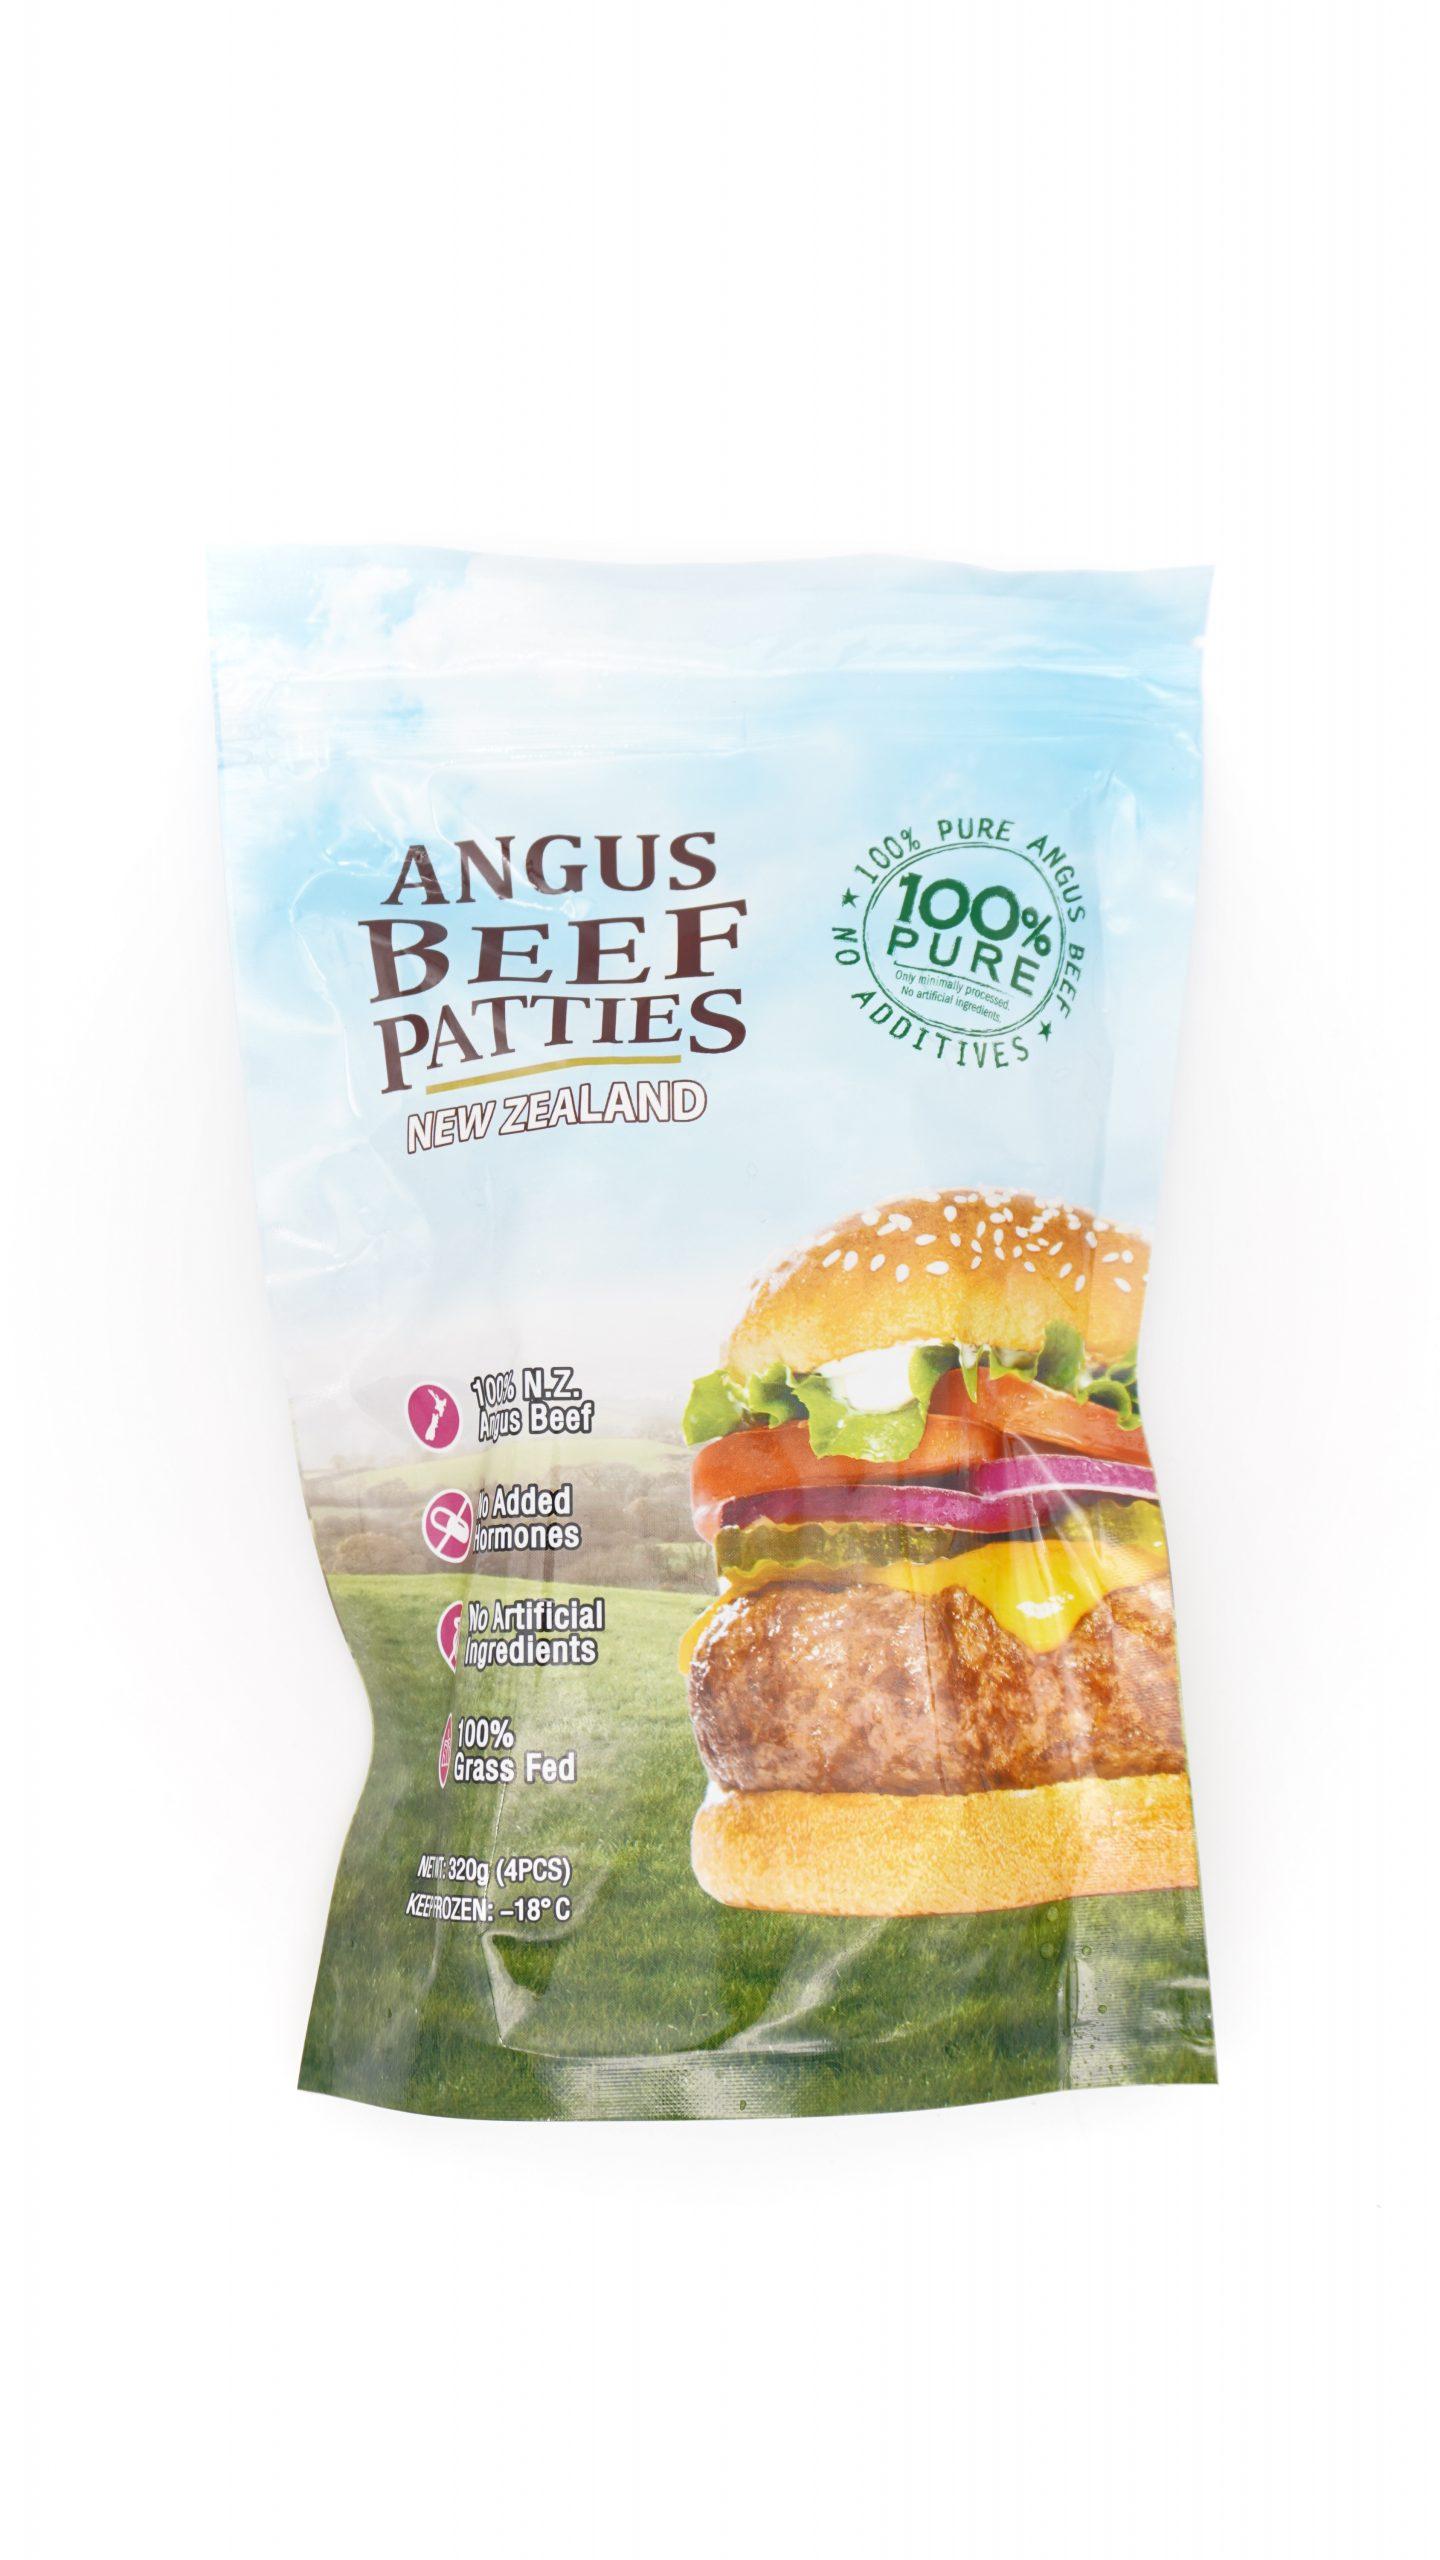 New Zealand Angus Beef Patties 320g 4pcs